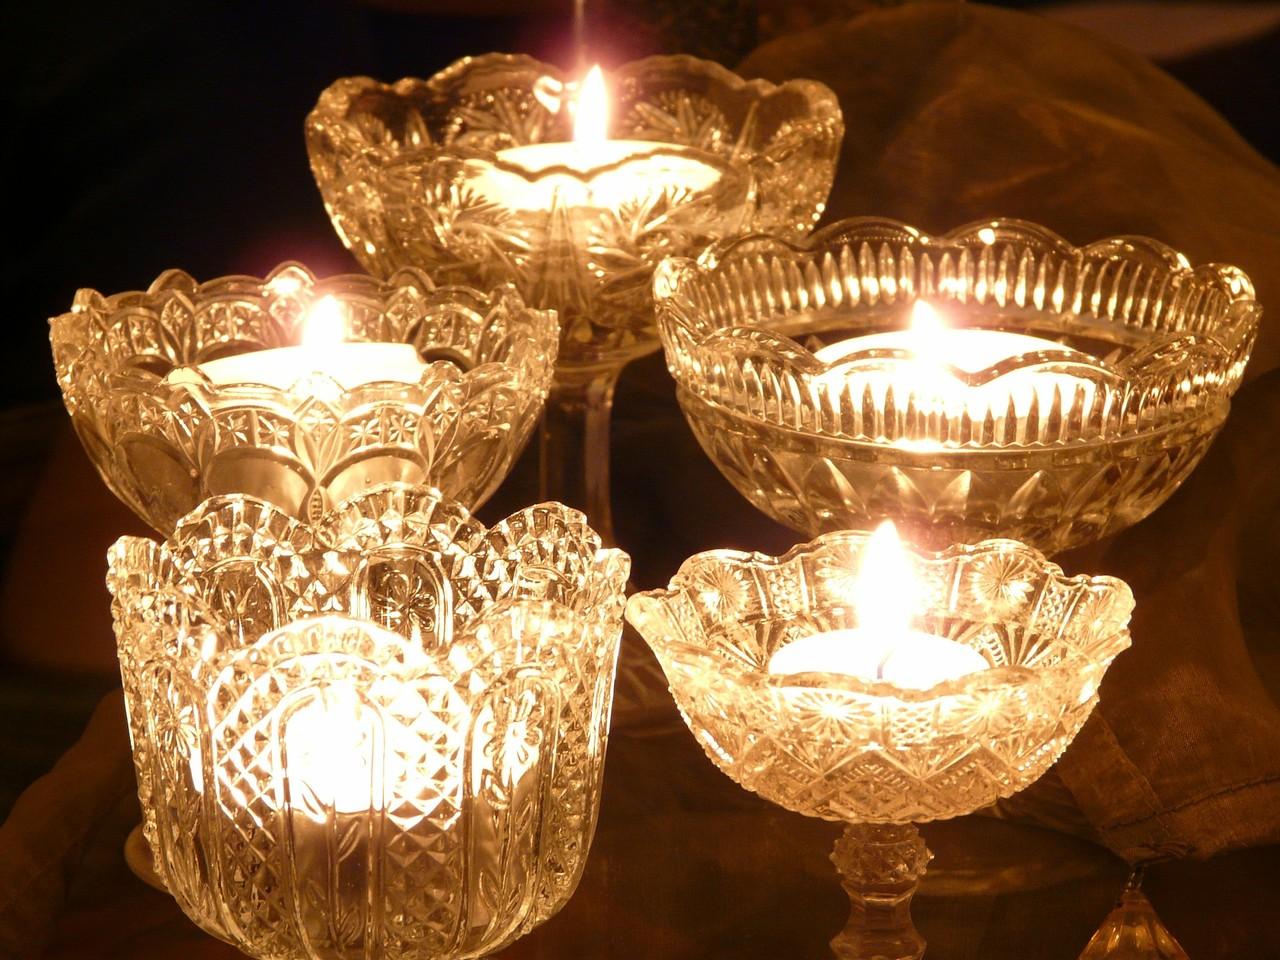 candles-11335_1920.jpg